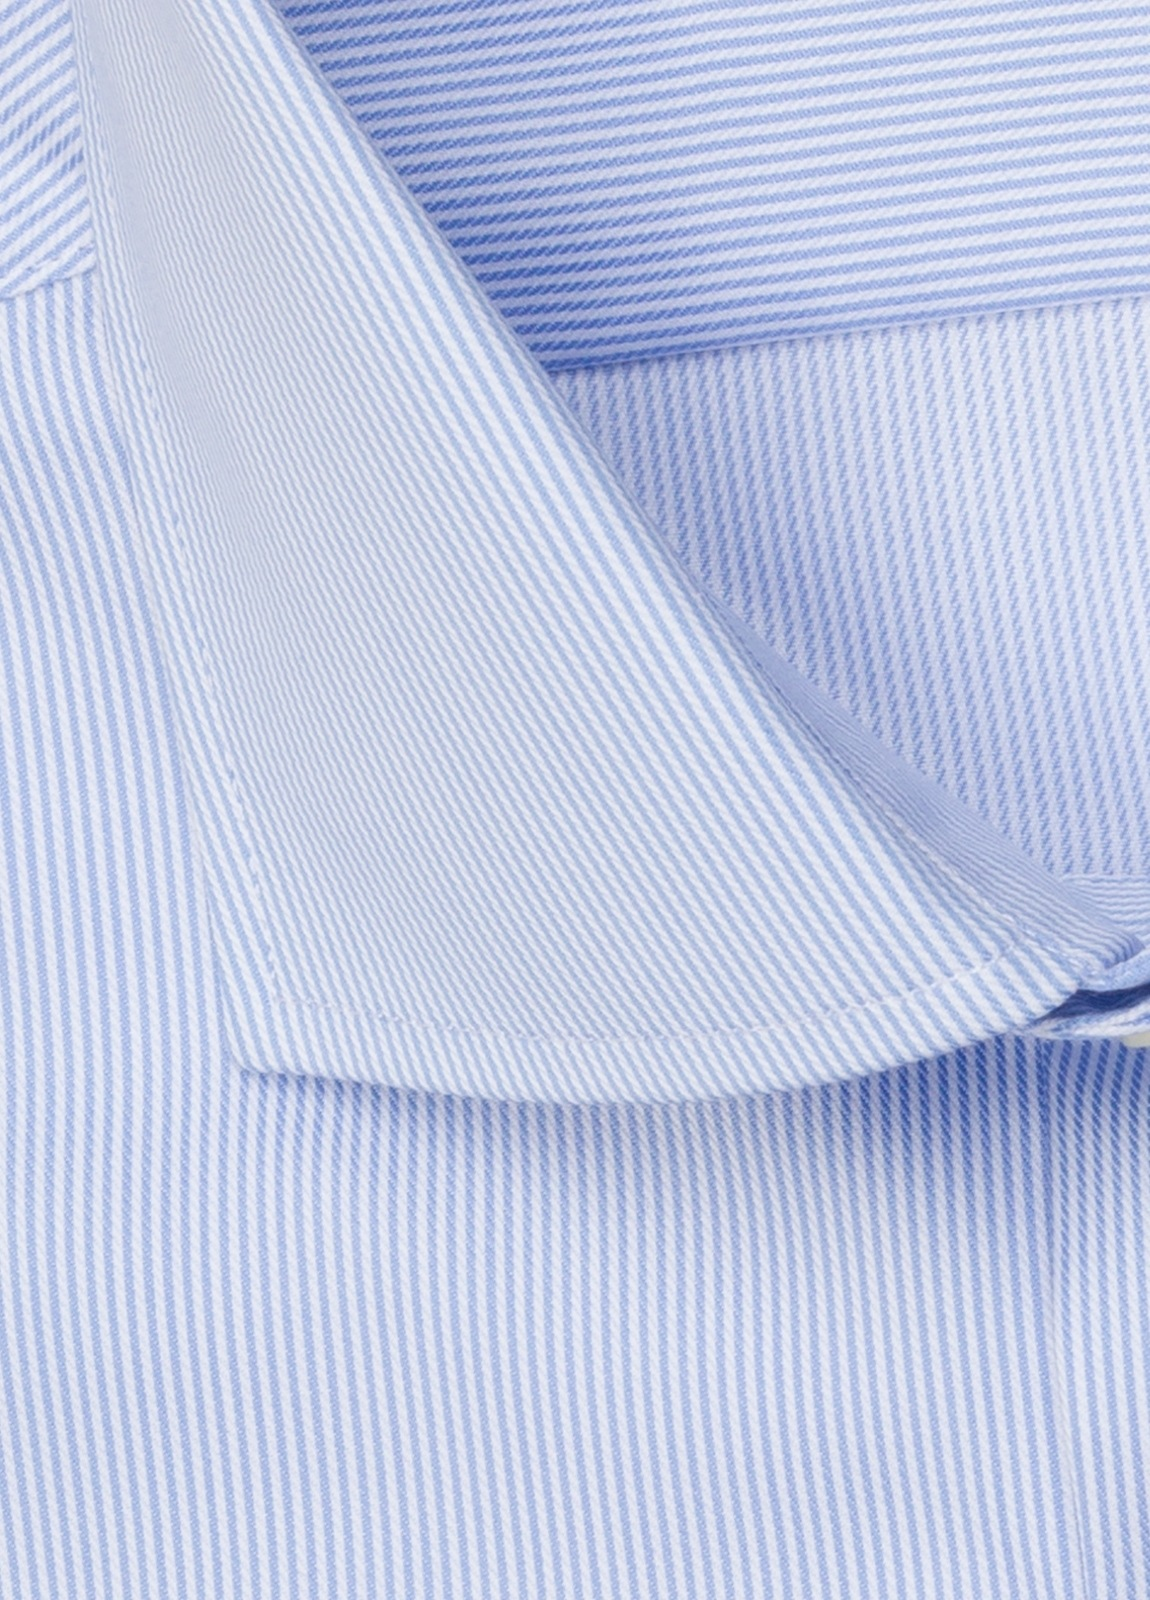 Camisa vestir FUREST COLECCIÓN regular fit cuello italiano rayas celeste - Ítem2